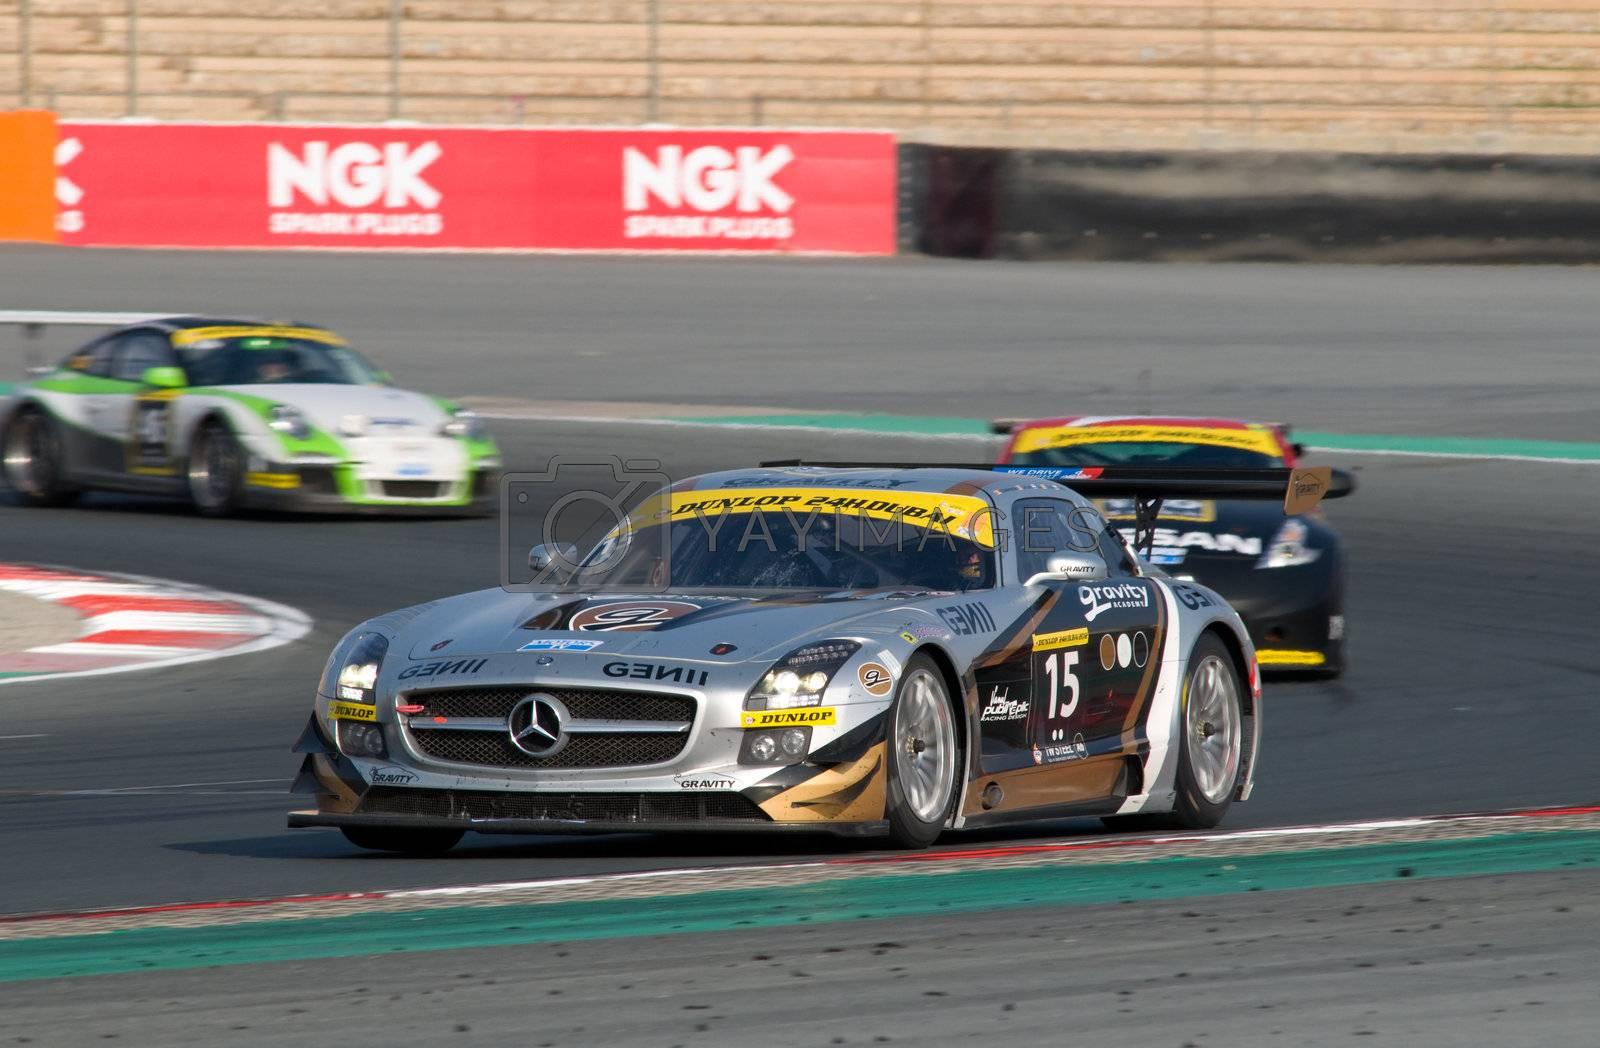 DUBAI - JANUARY 13: Car 15, a Mercedes SLS AMG GT3, participating in the 2012 Dunlop 24 Hour Race at Dubai Autodrome on January 13, 2012.